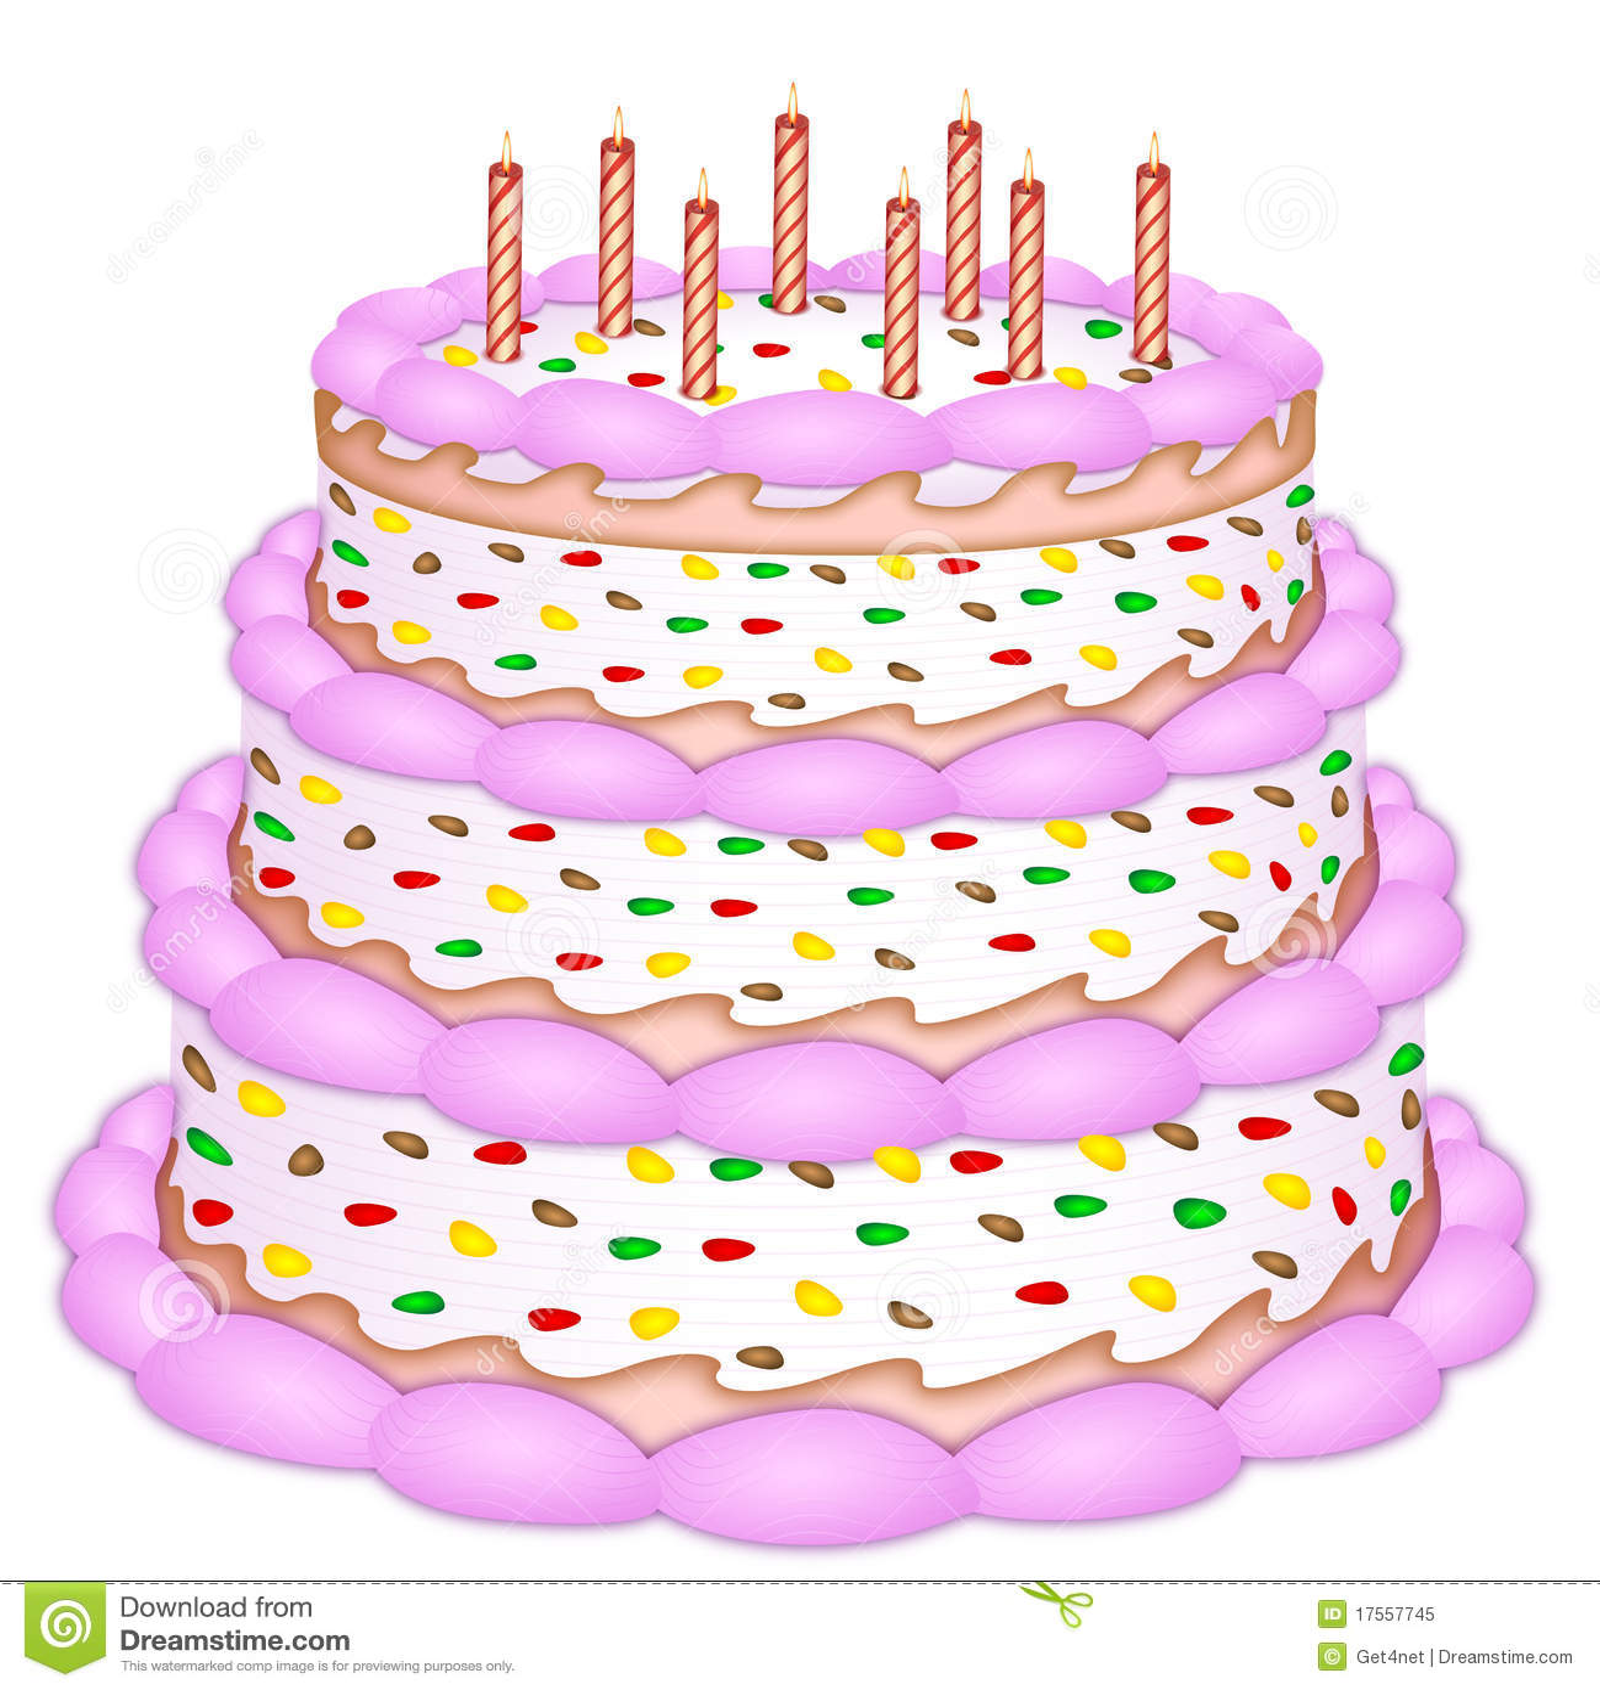 Decorative birthday cake